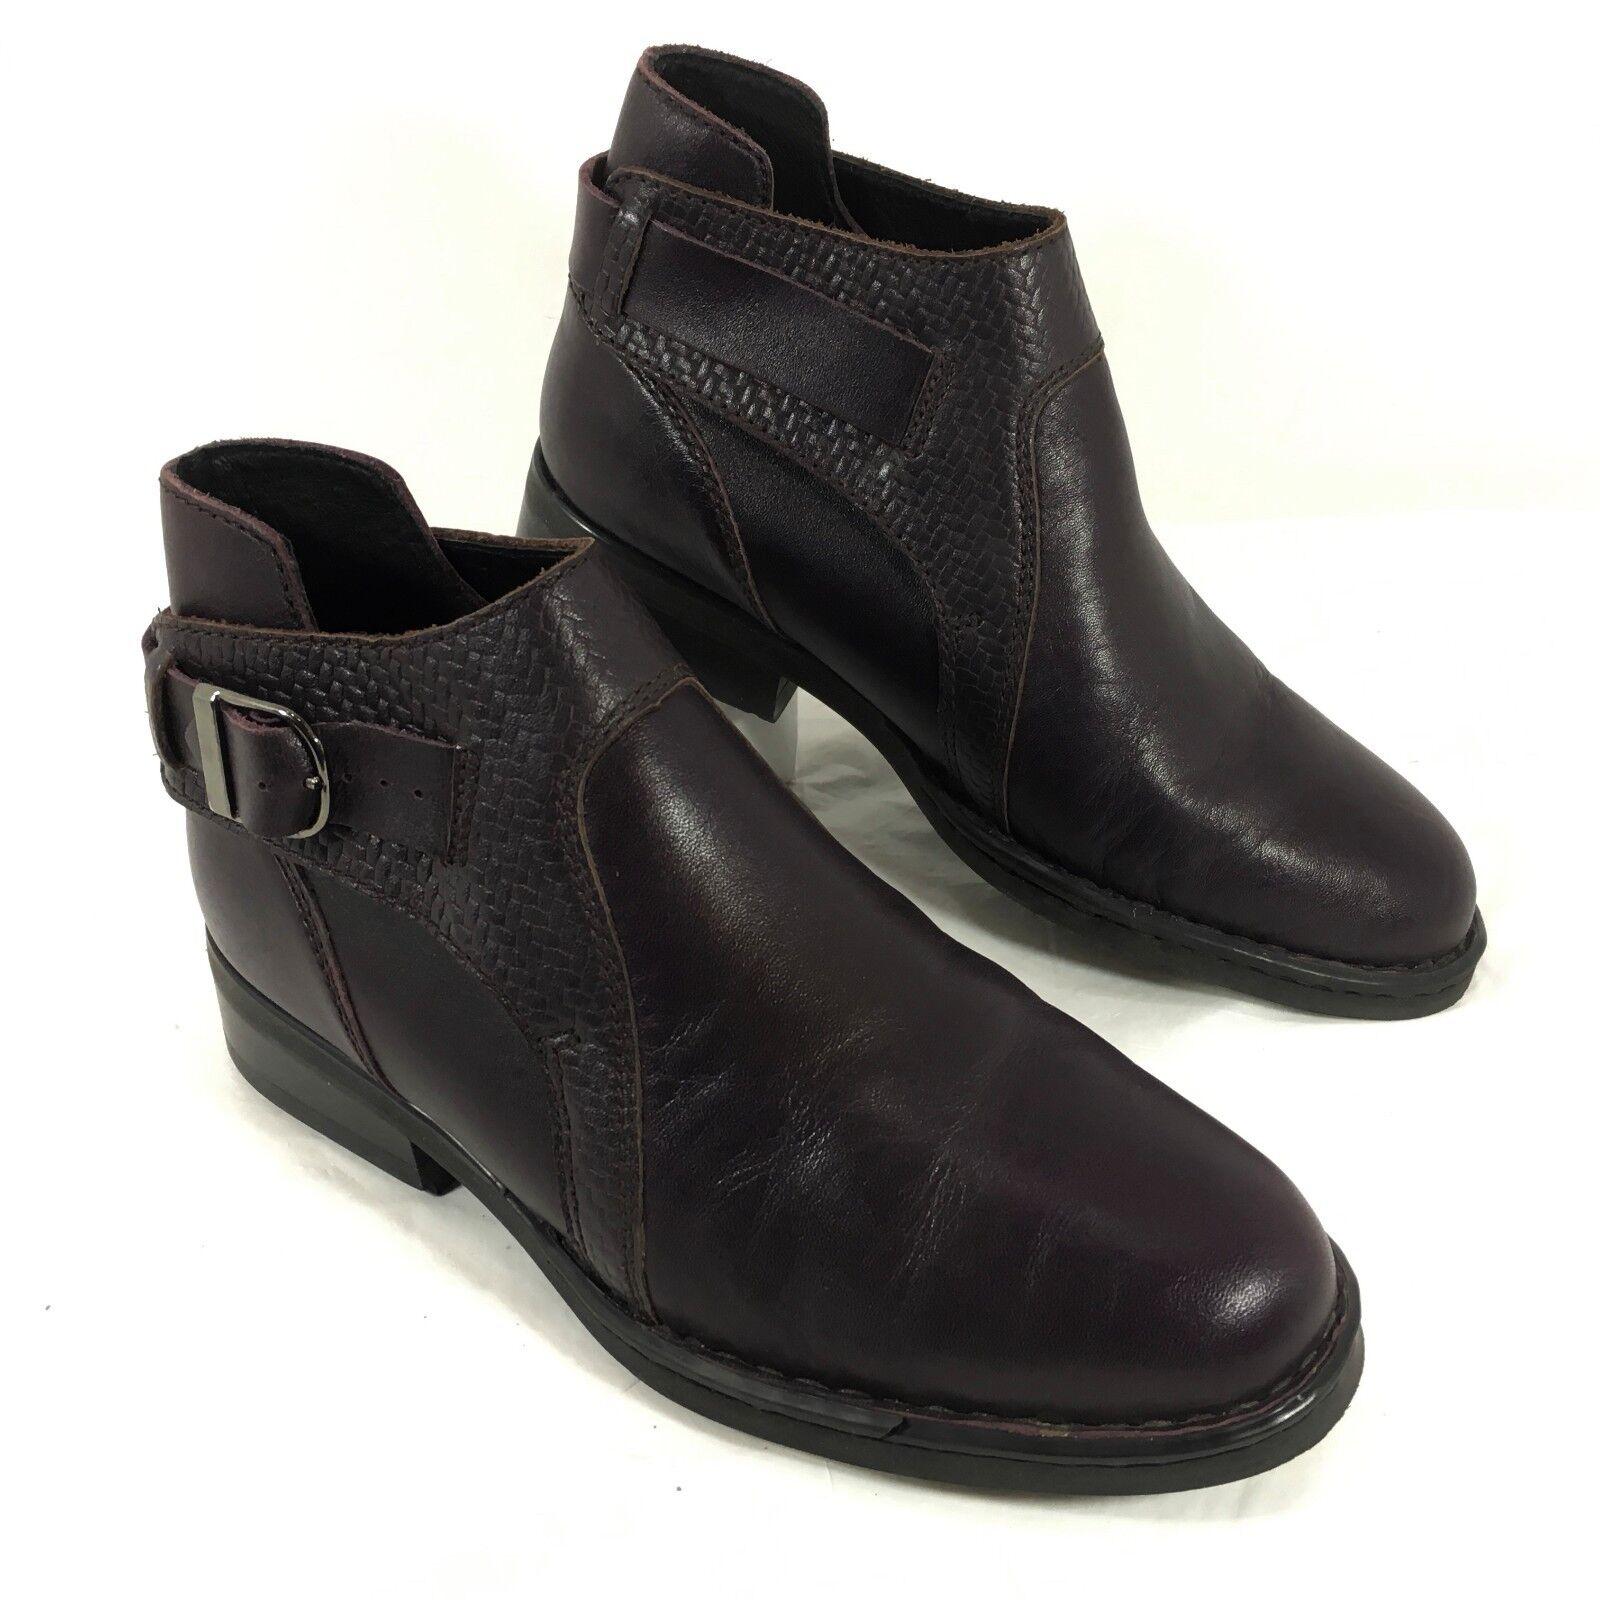 Women's Double H HH Purple leather ankle boots Sz 7.5 M